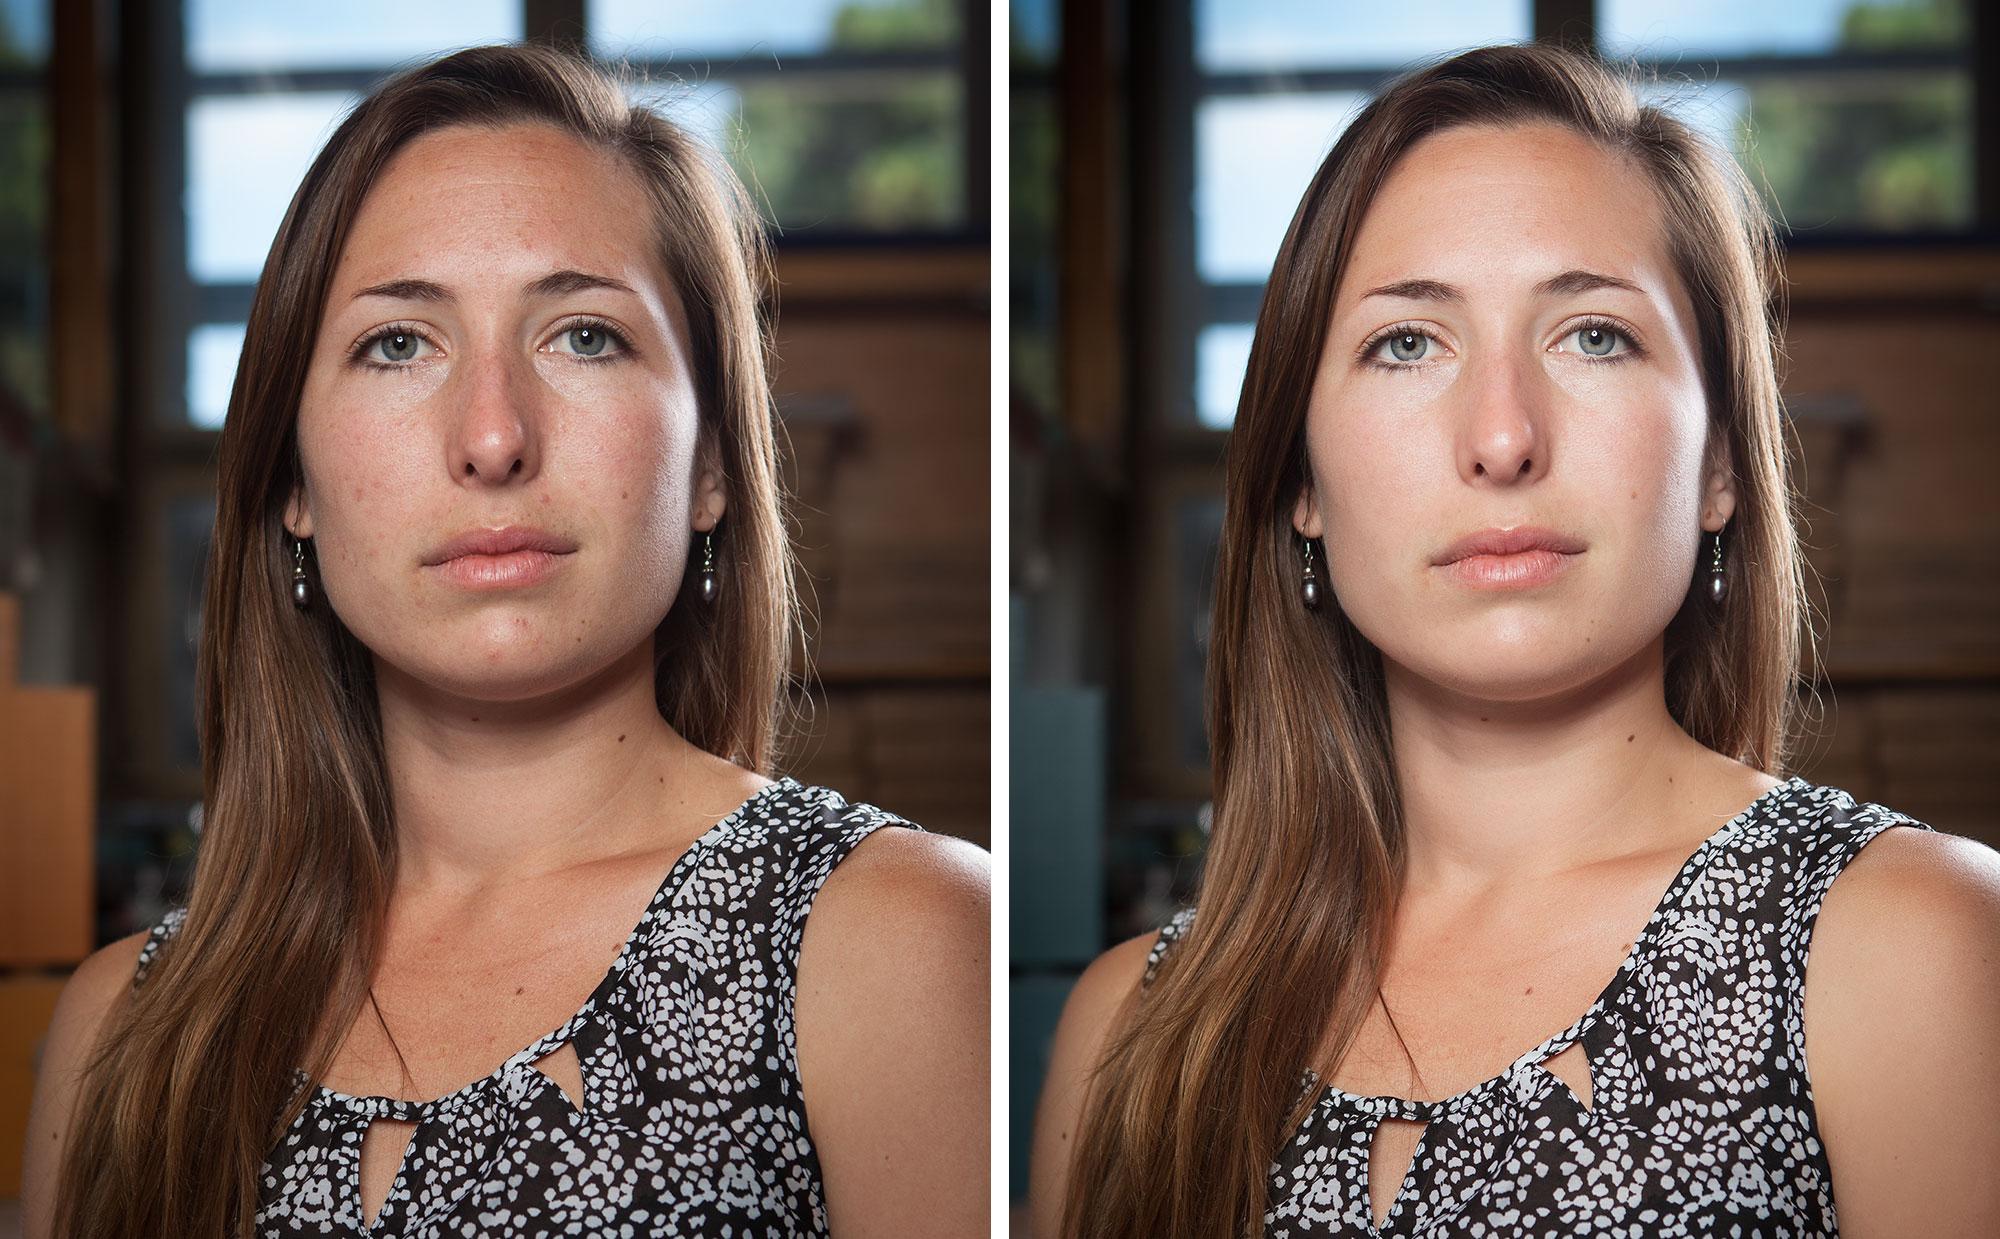 Professional Retouching I: Female Portrait by Alex Kay